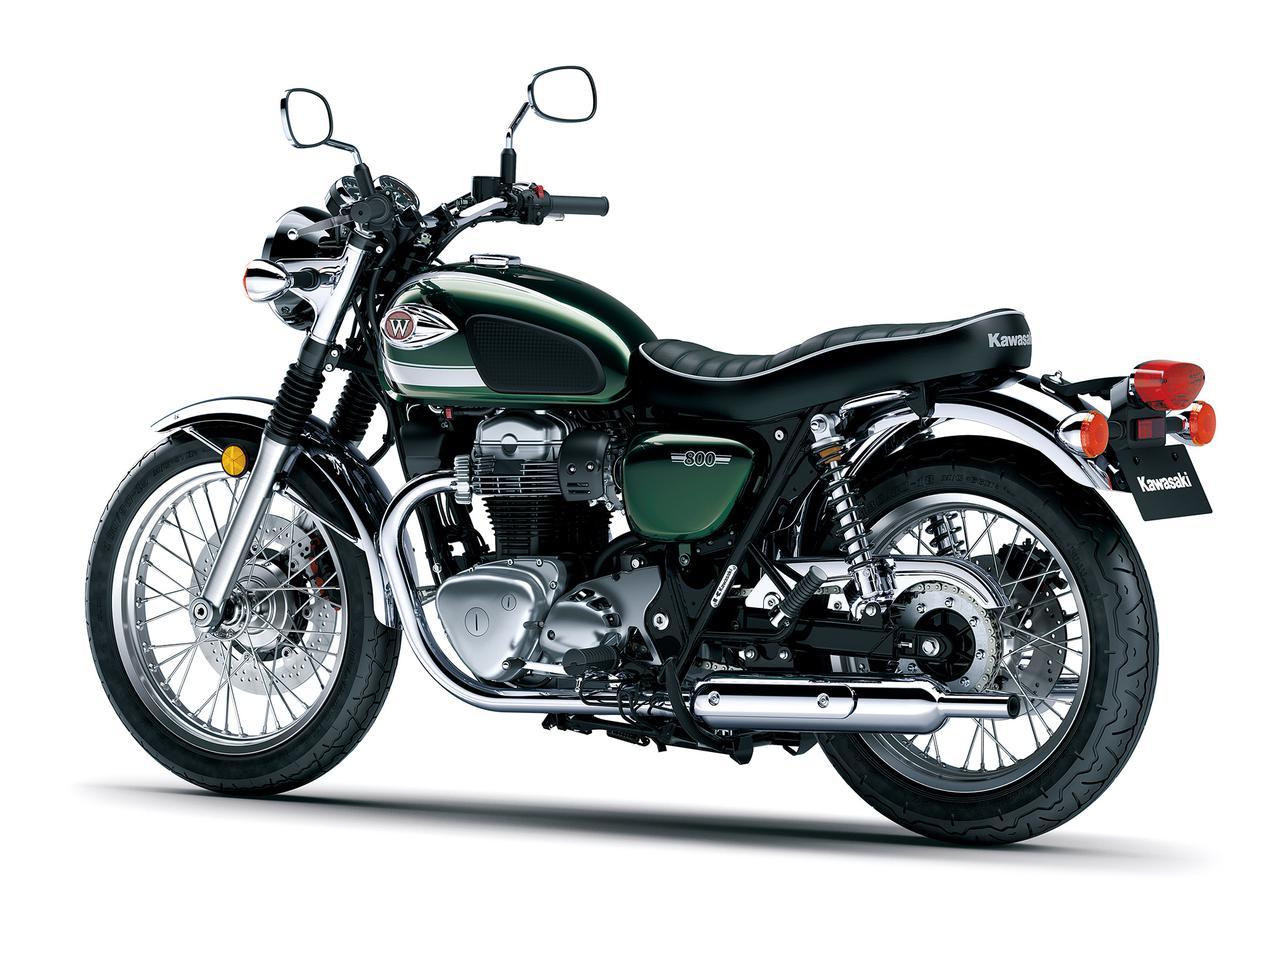 Images : 3番目の画像 - KAWASAKI W800の写真をまとめて見る! - webオートバイ